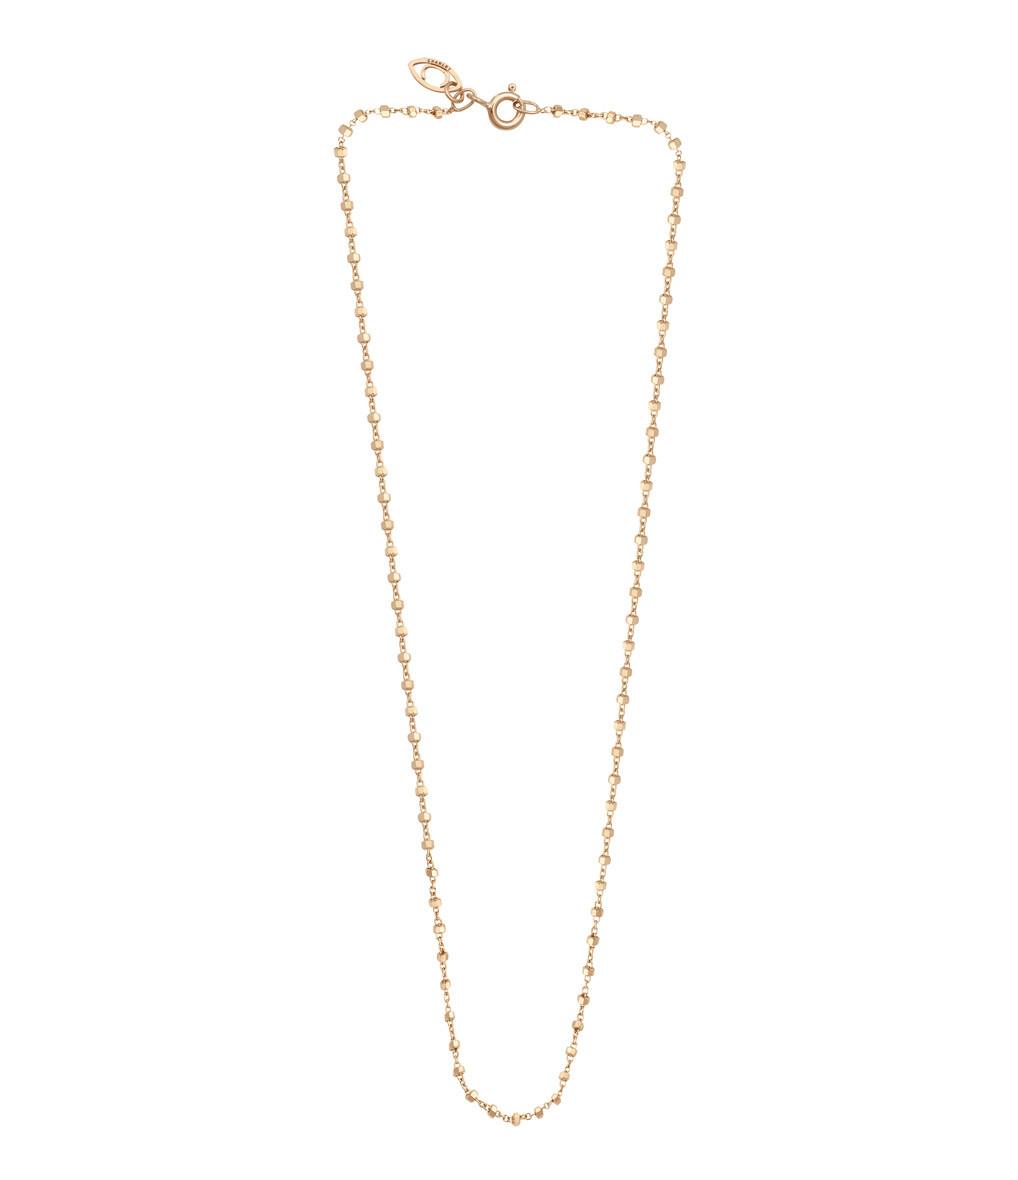 Chaîne Diamantée 45 cm - CHARLET